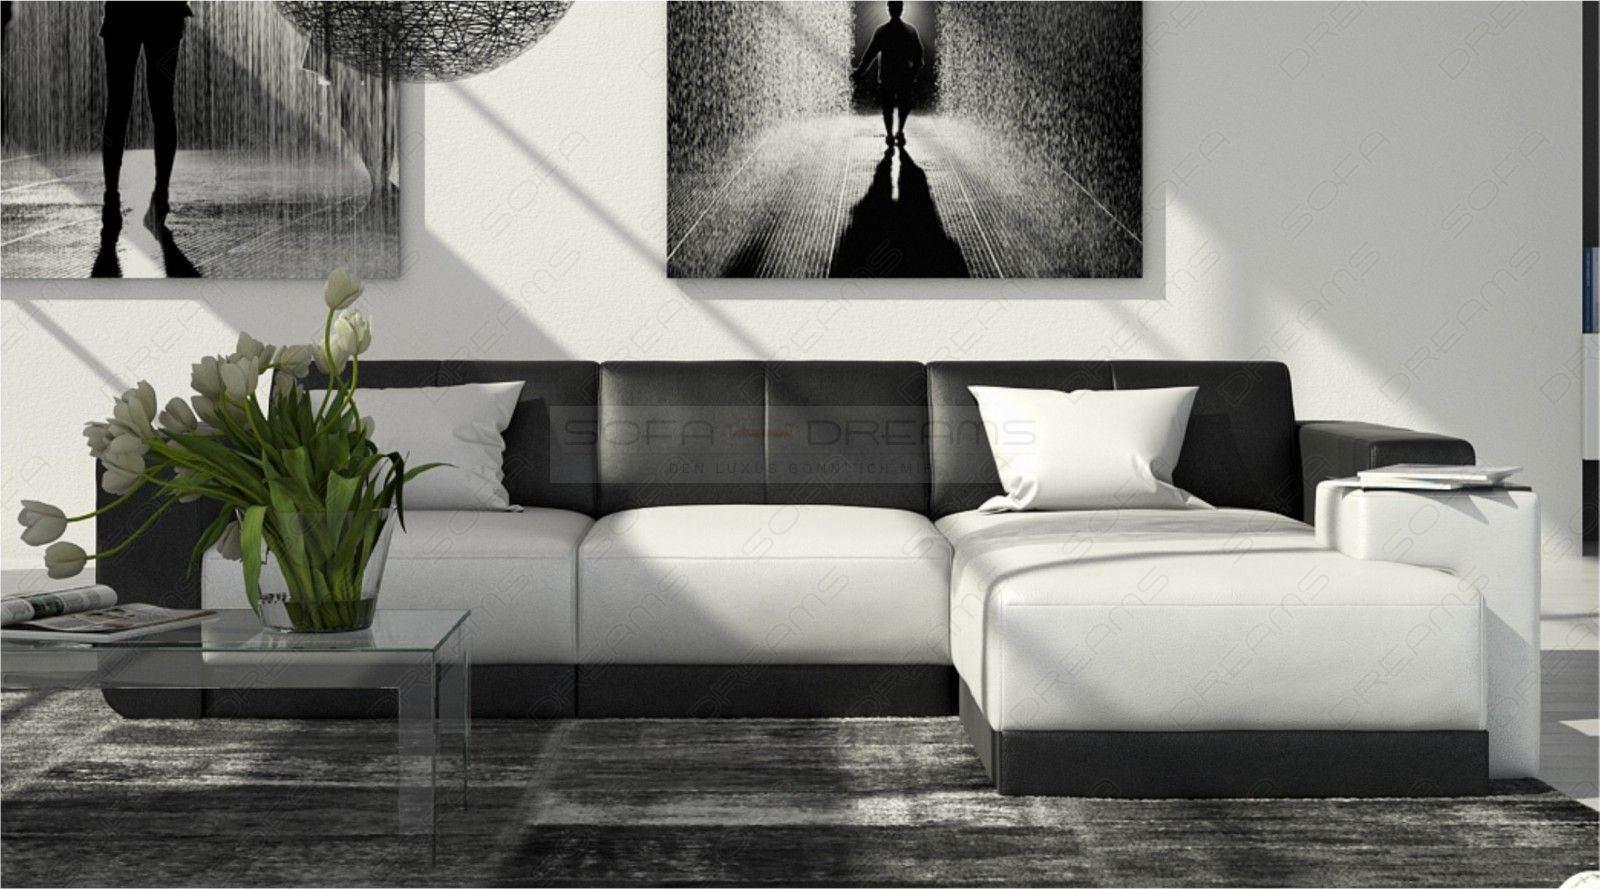 bequemes ledersofa ferragamo als l form mit ottomane. Black Bedroom Furniture Sets. Home Design Ideas